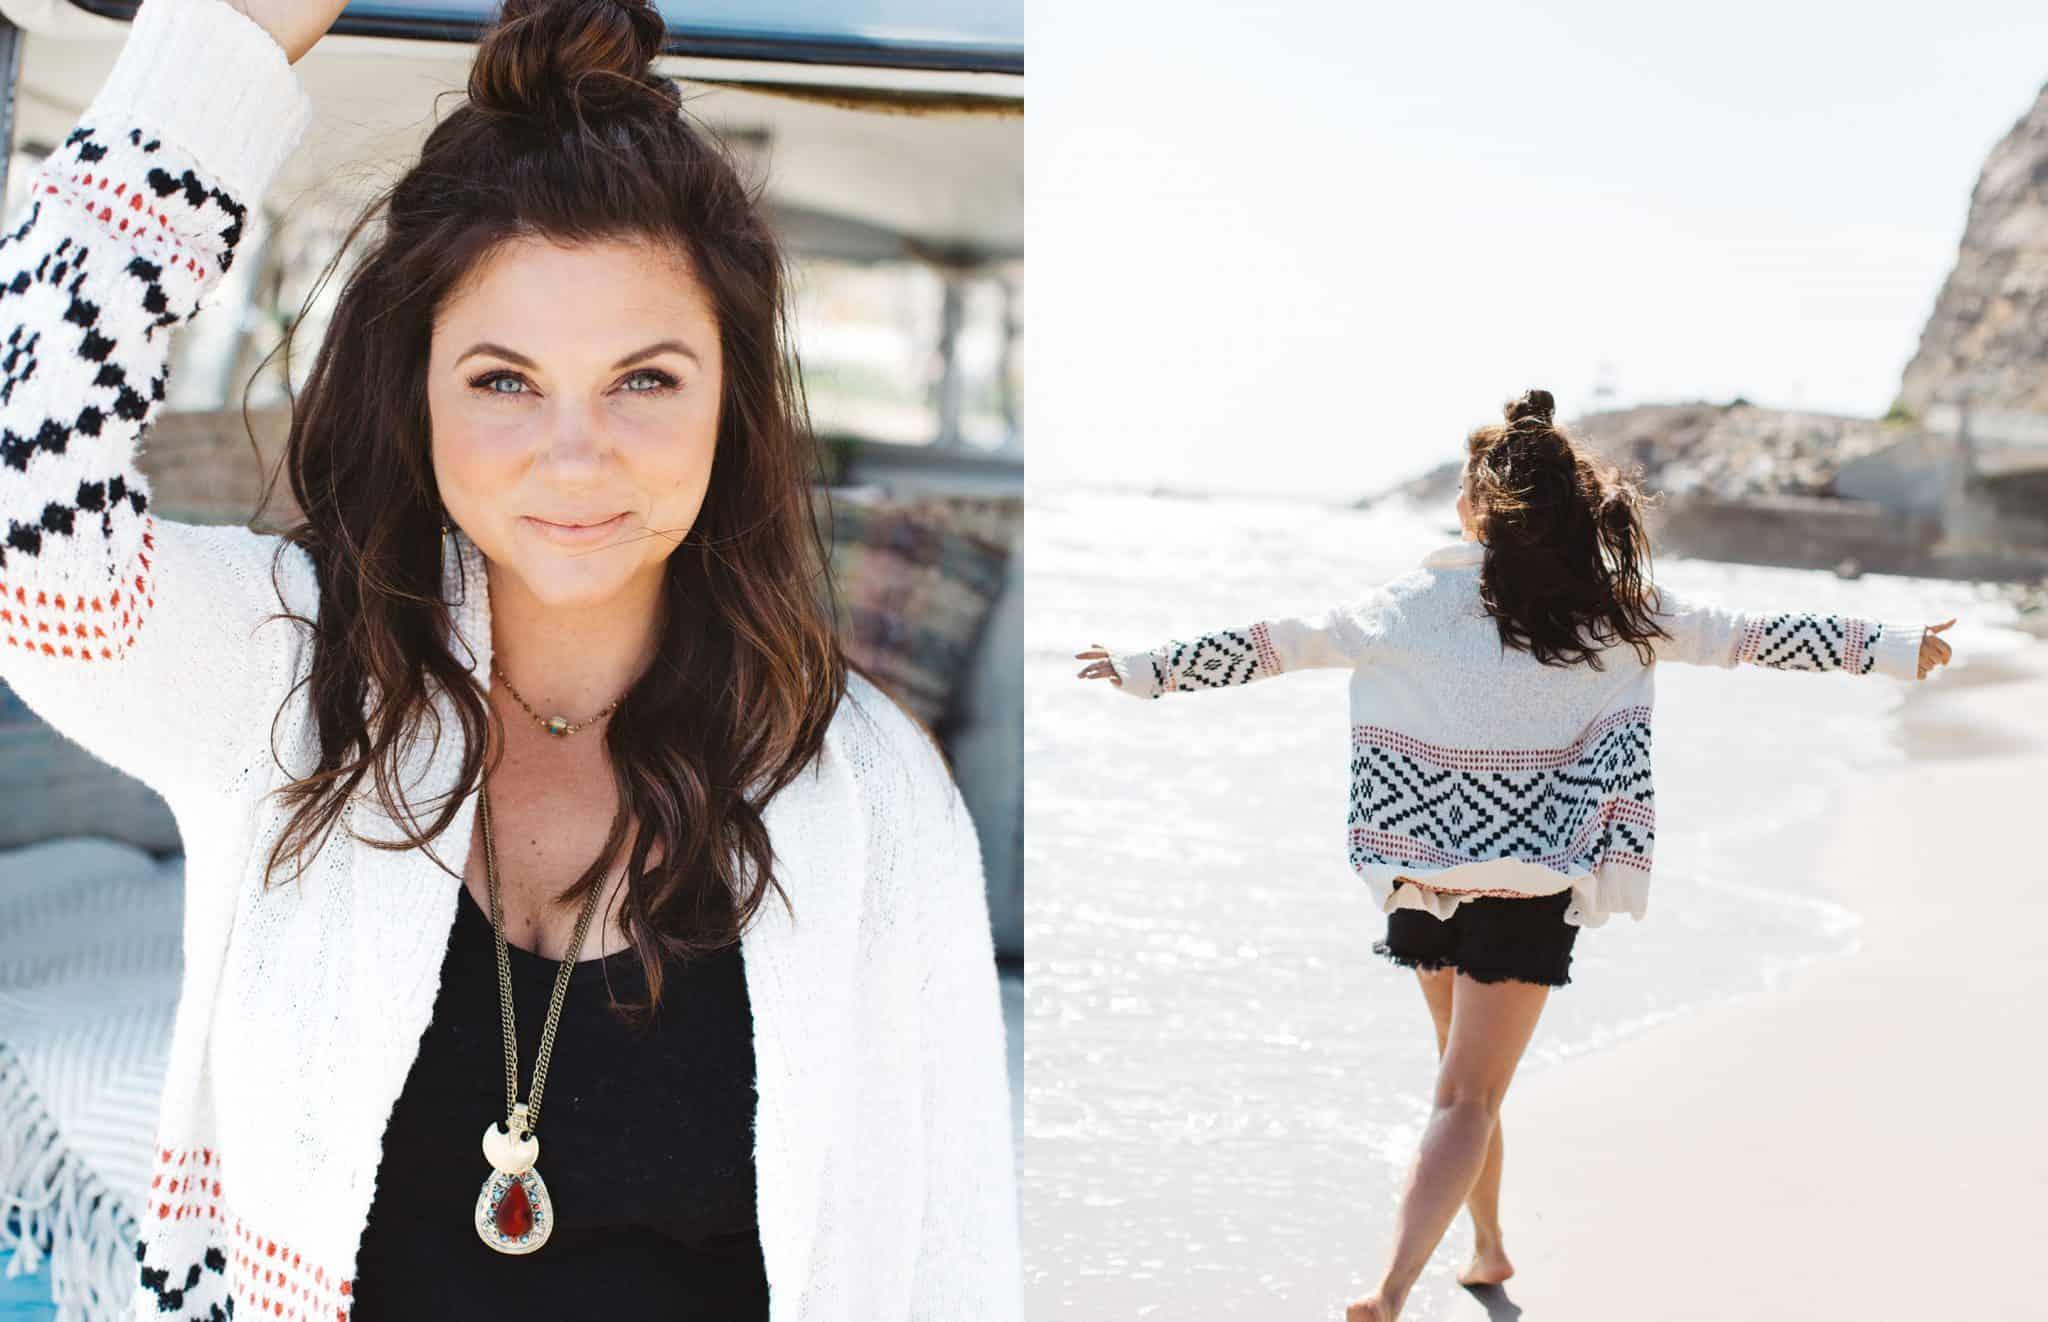 Summer Days by Tiffani Thiessen • Photo by Brandon Kidd